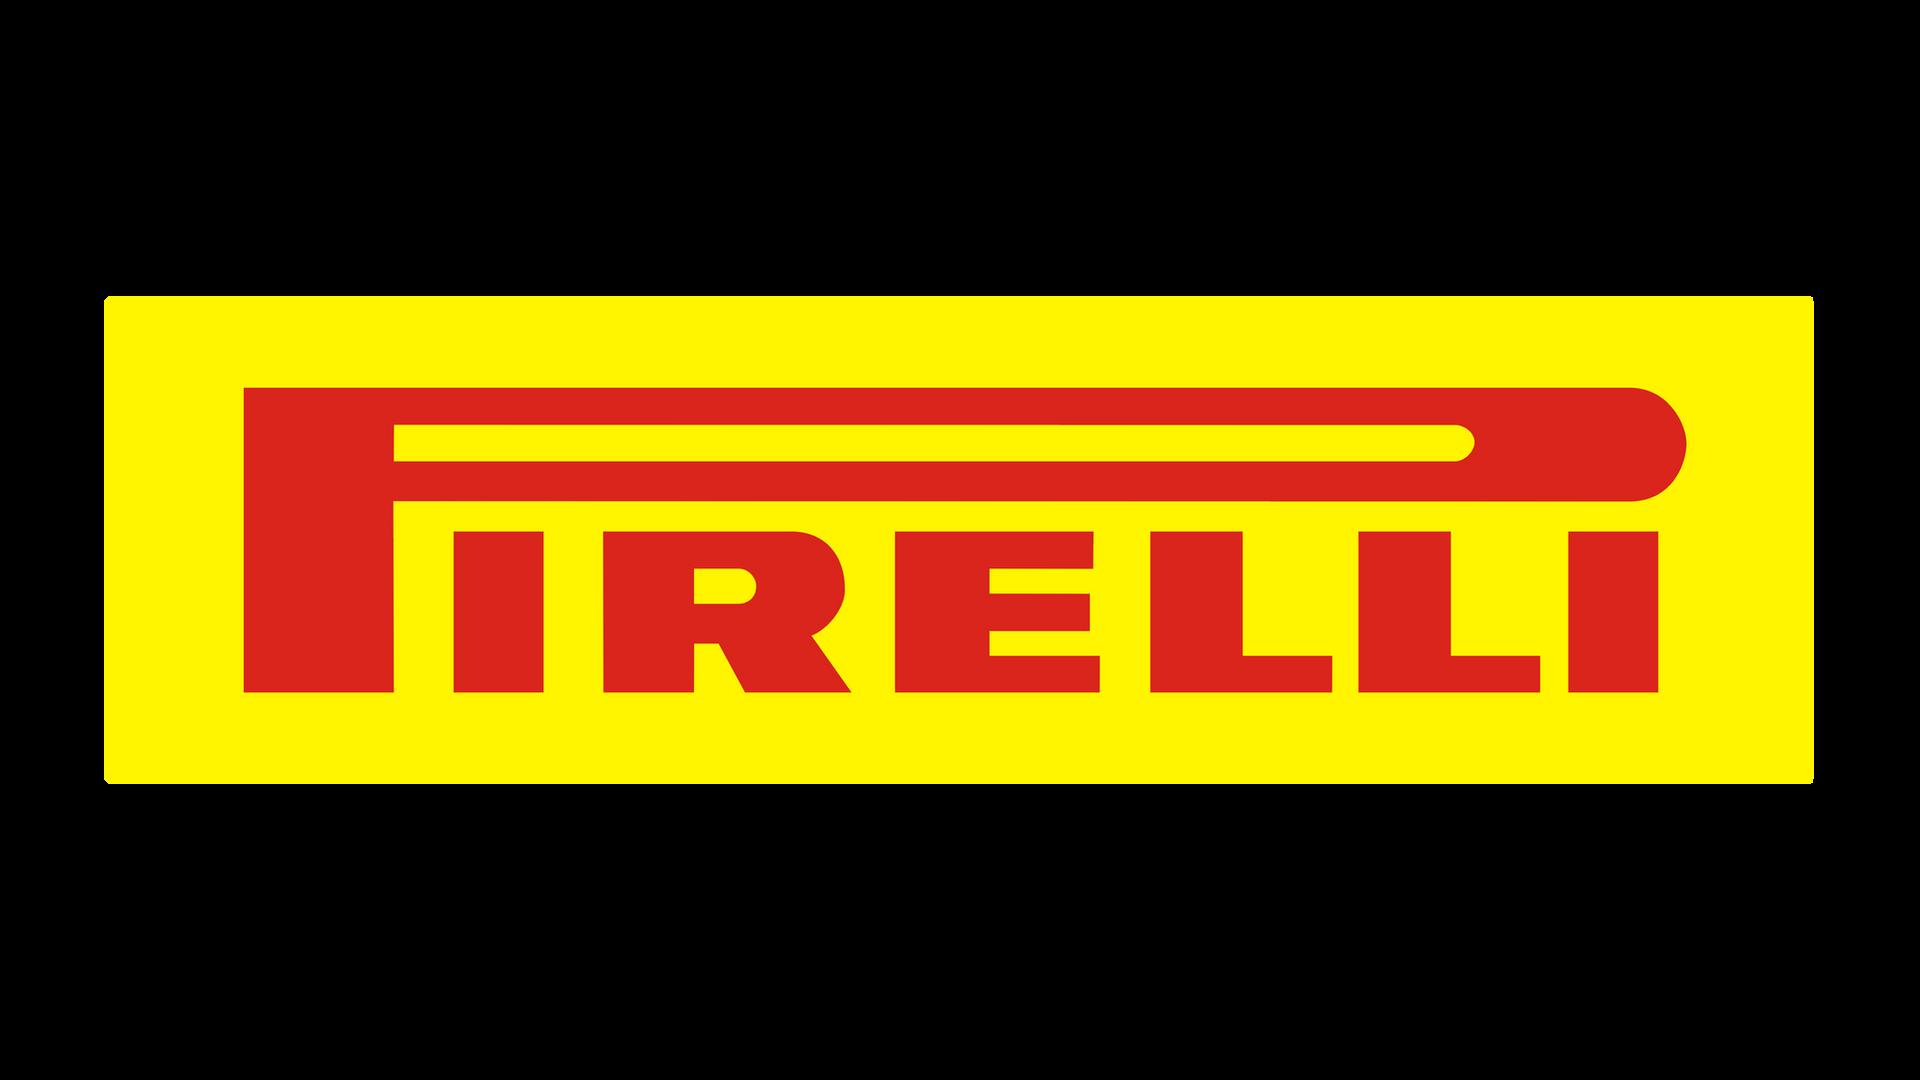 Pirelli-logo-3840x2160-2.png